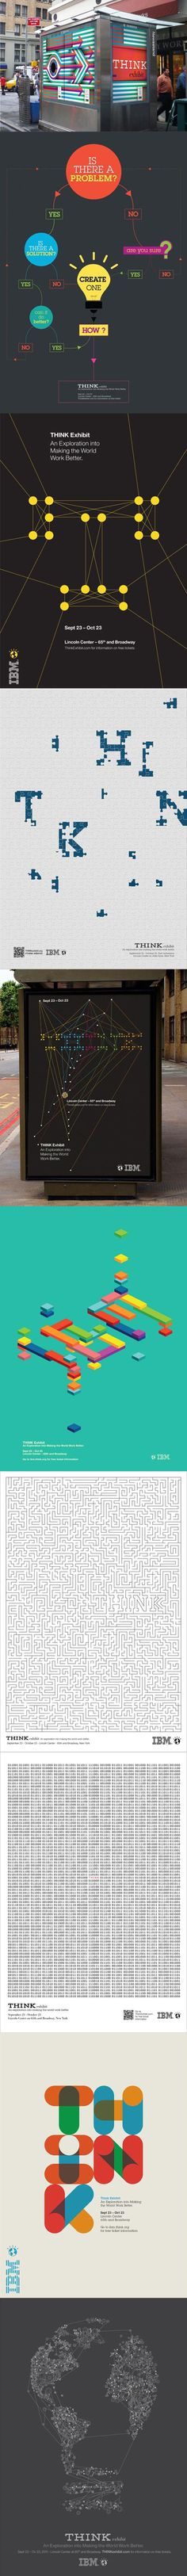 IBM posters | THINK